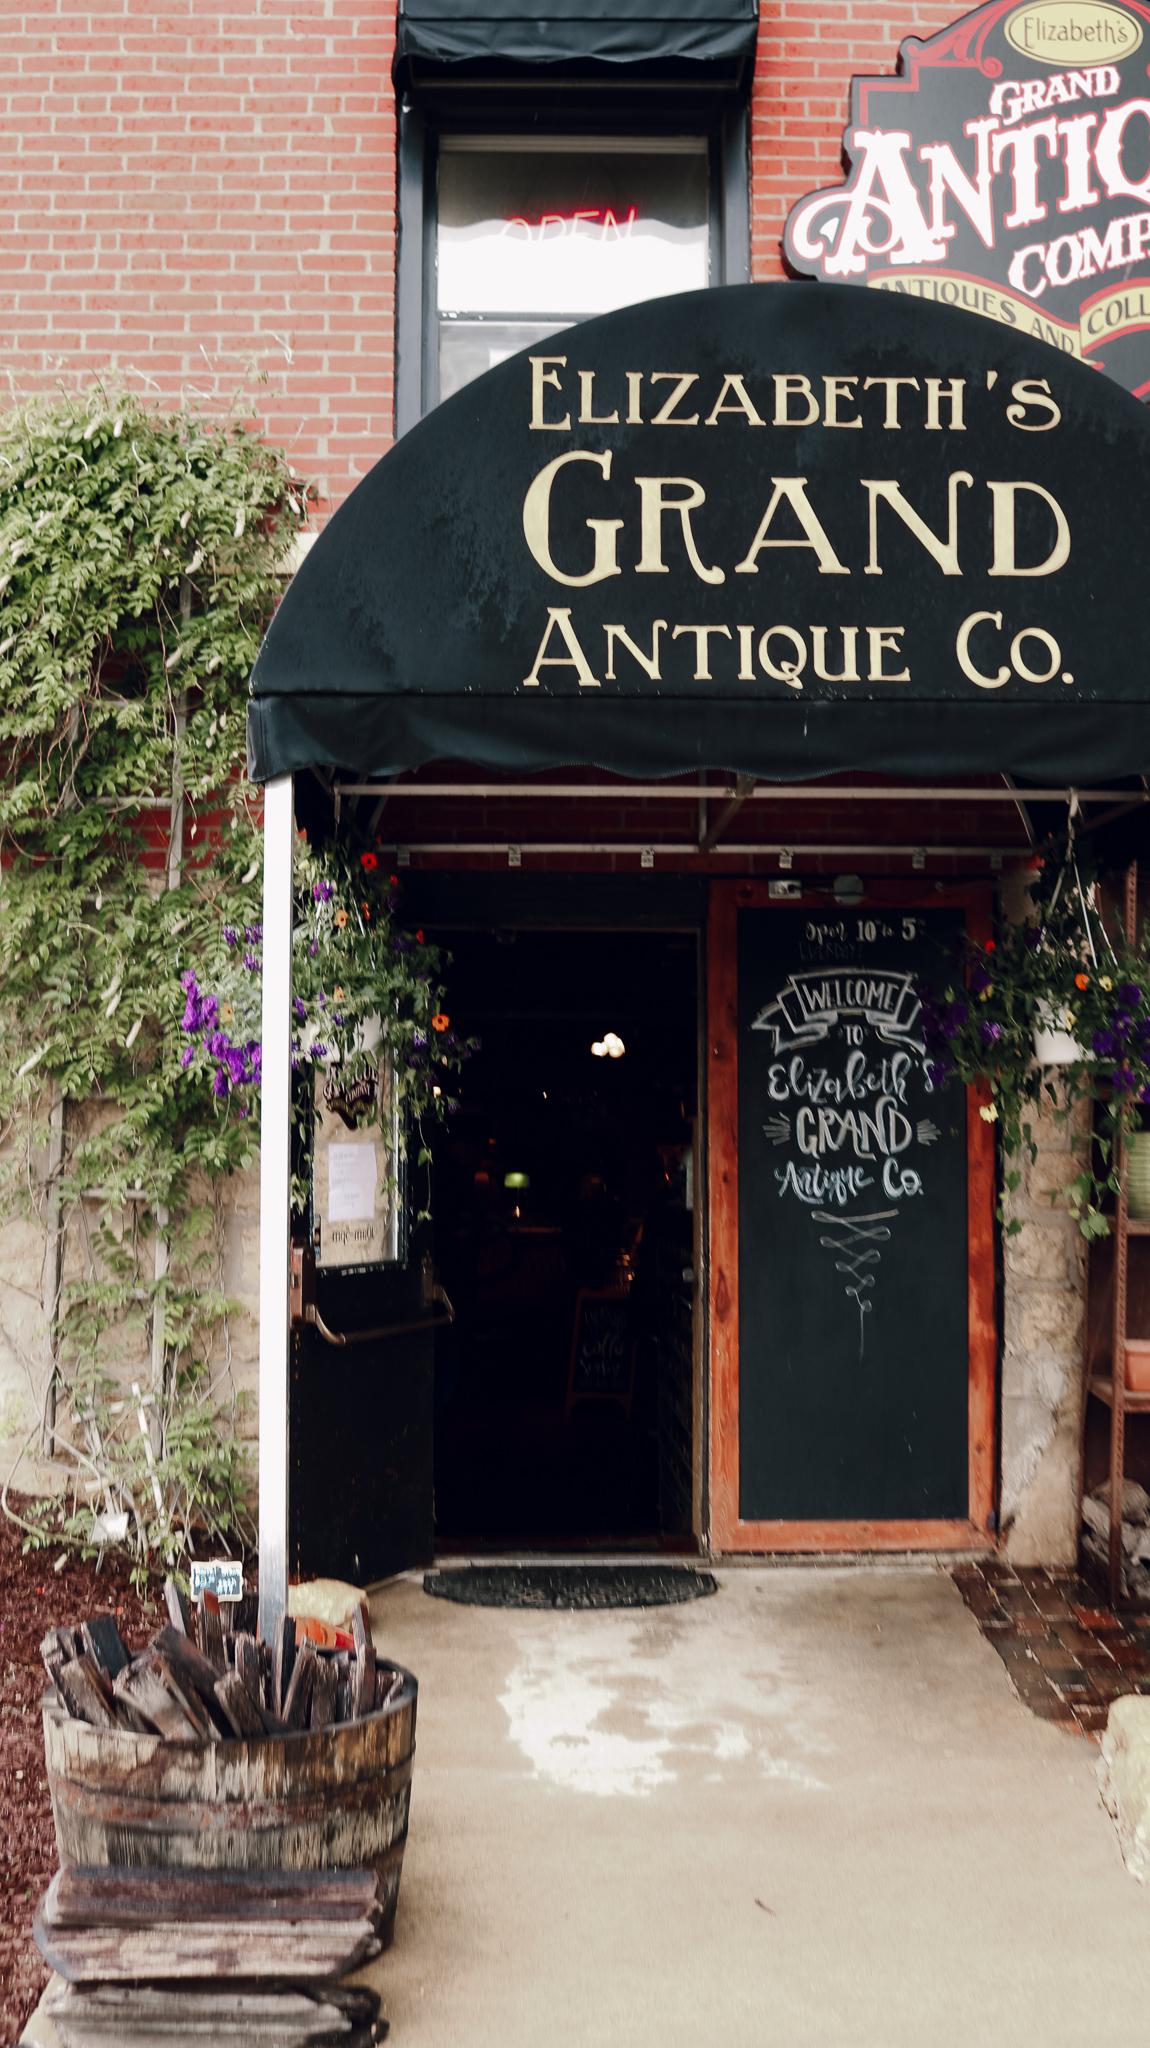 Elizabeth Grand Antique Company